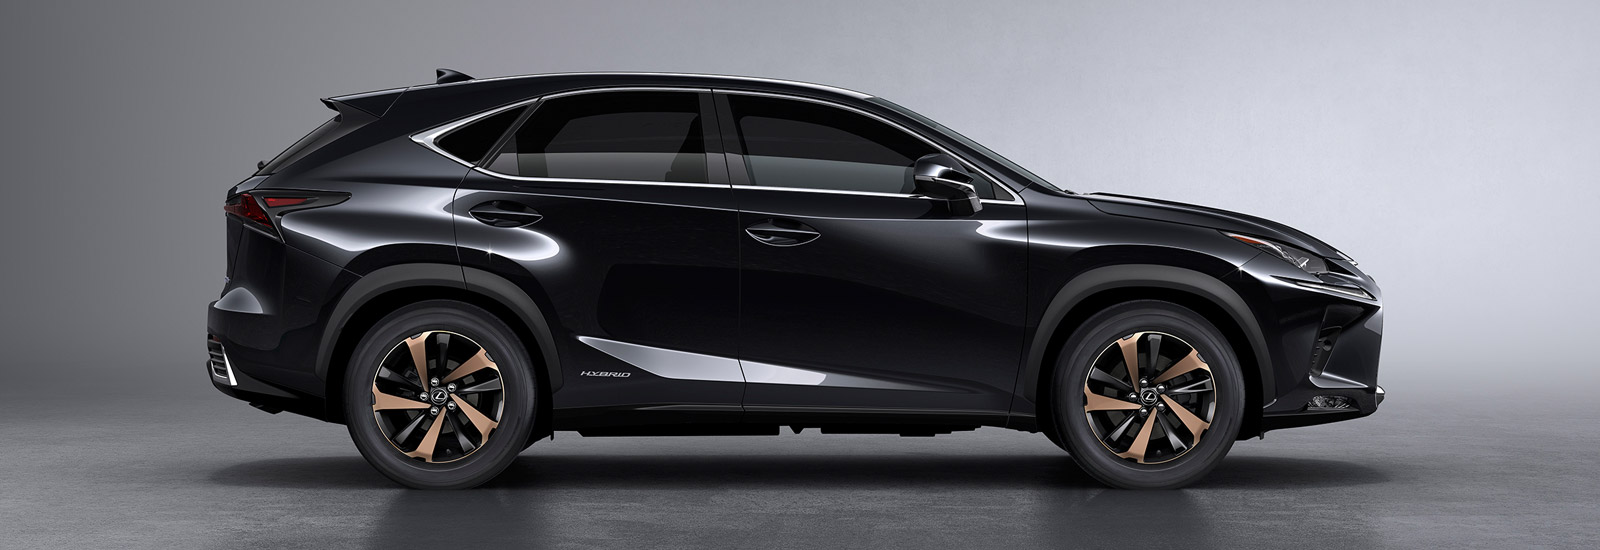 2018 lexus model release. wonderful lexus 2018 lexus nx facelift engines and driving intended lexus model release